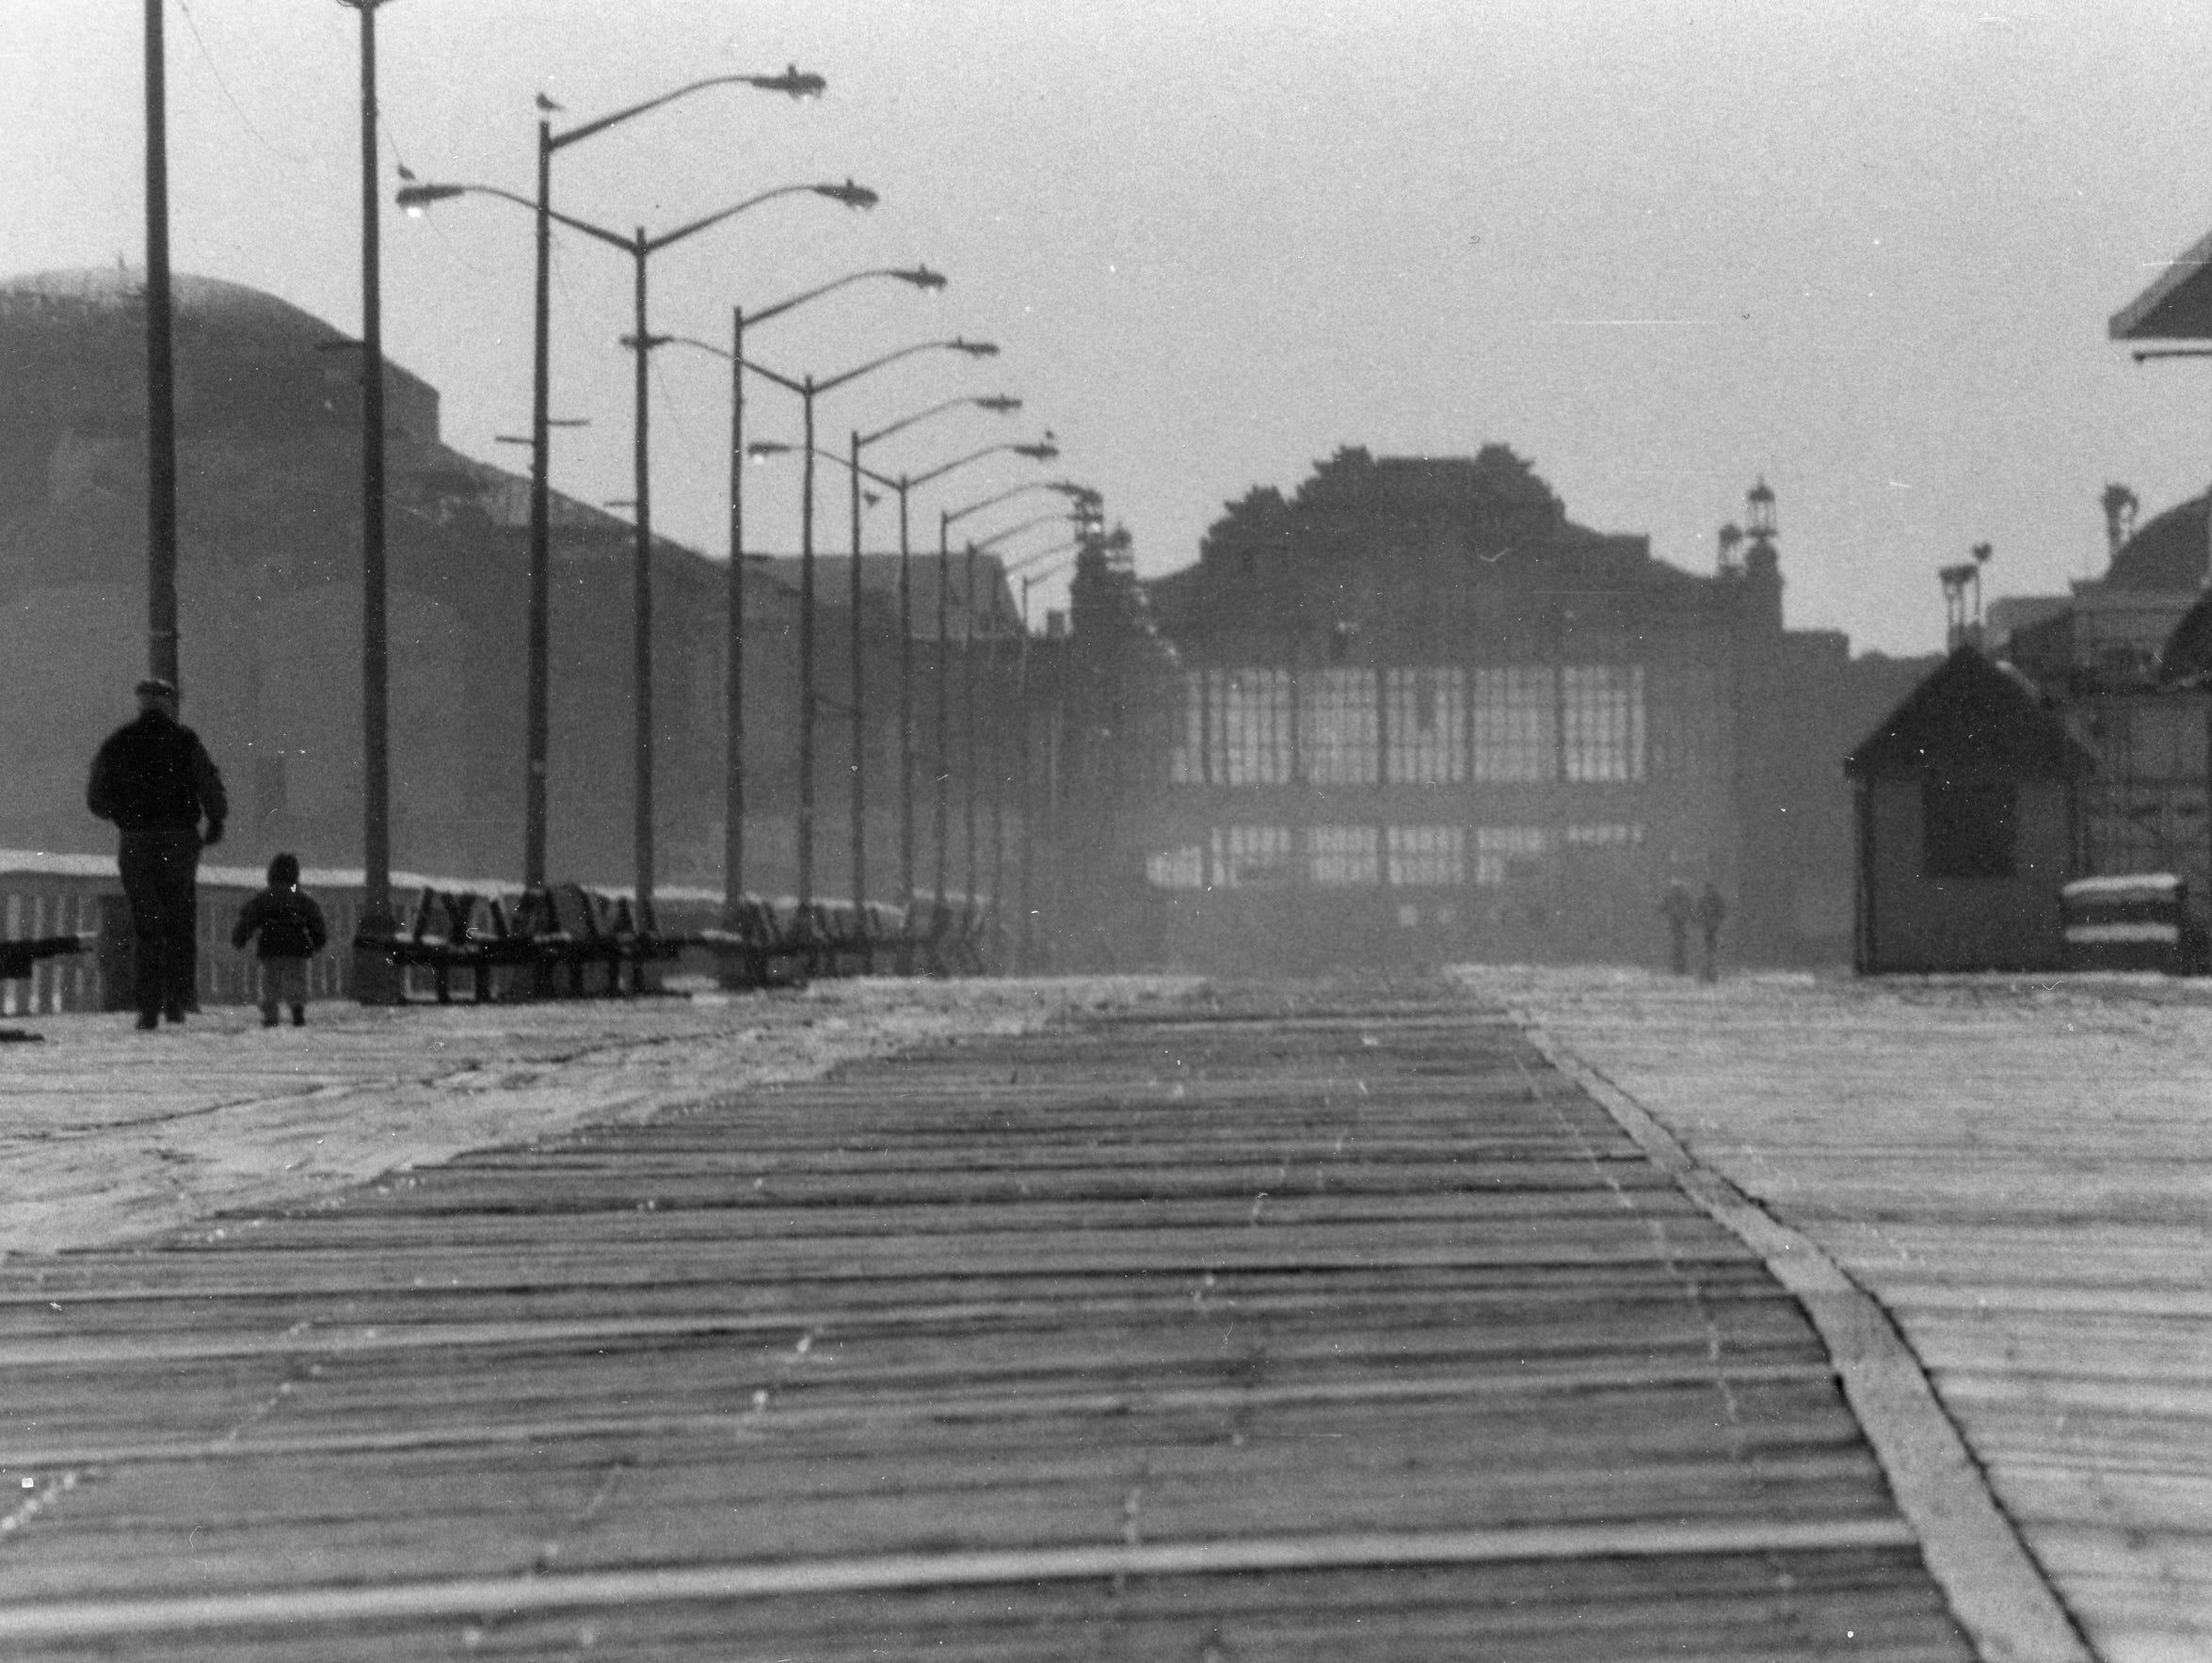 The Asbury Park Boardwalk in 1996 was considerably